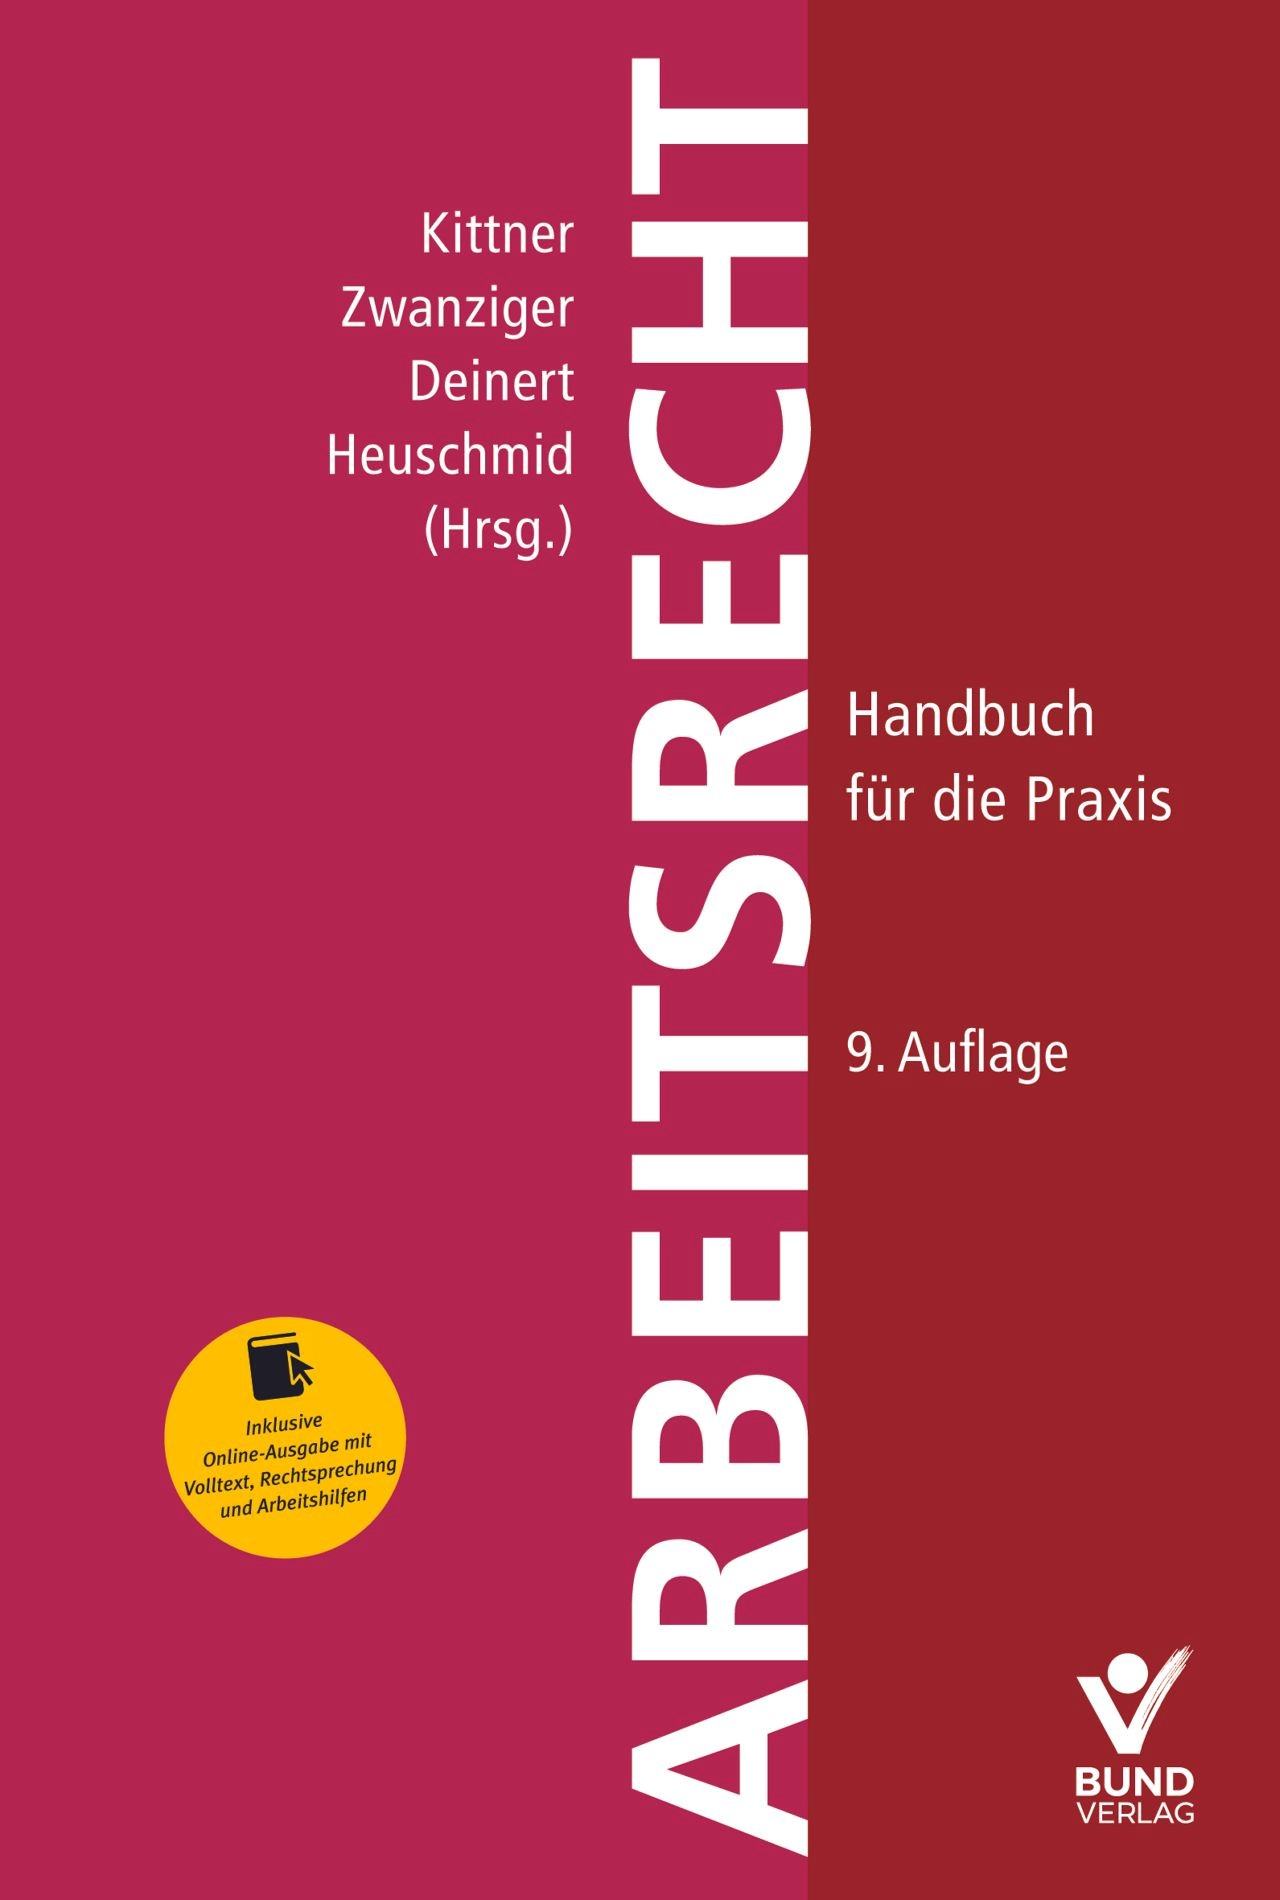 Arbeitsrecht | Kittner / Zwanziger / Deinert / Heuschmid (Hrsg.) | 9. Auflage, 2017 (Cover)